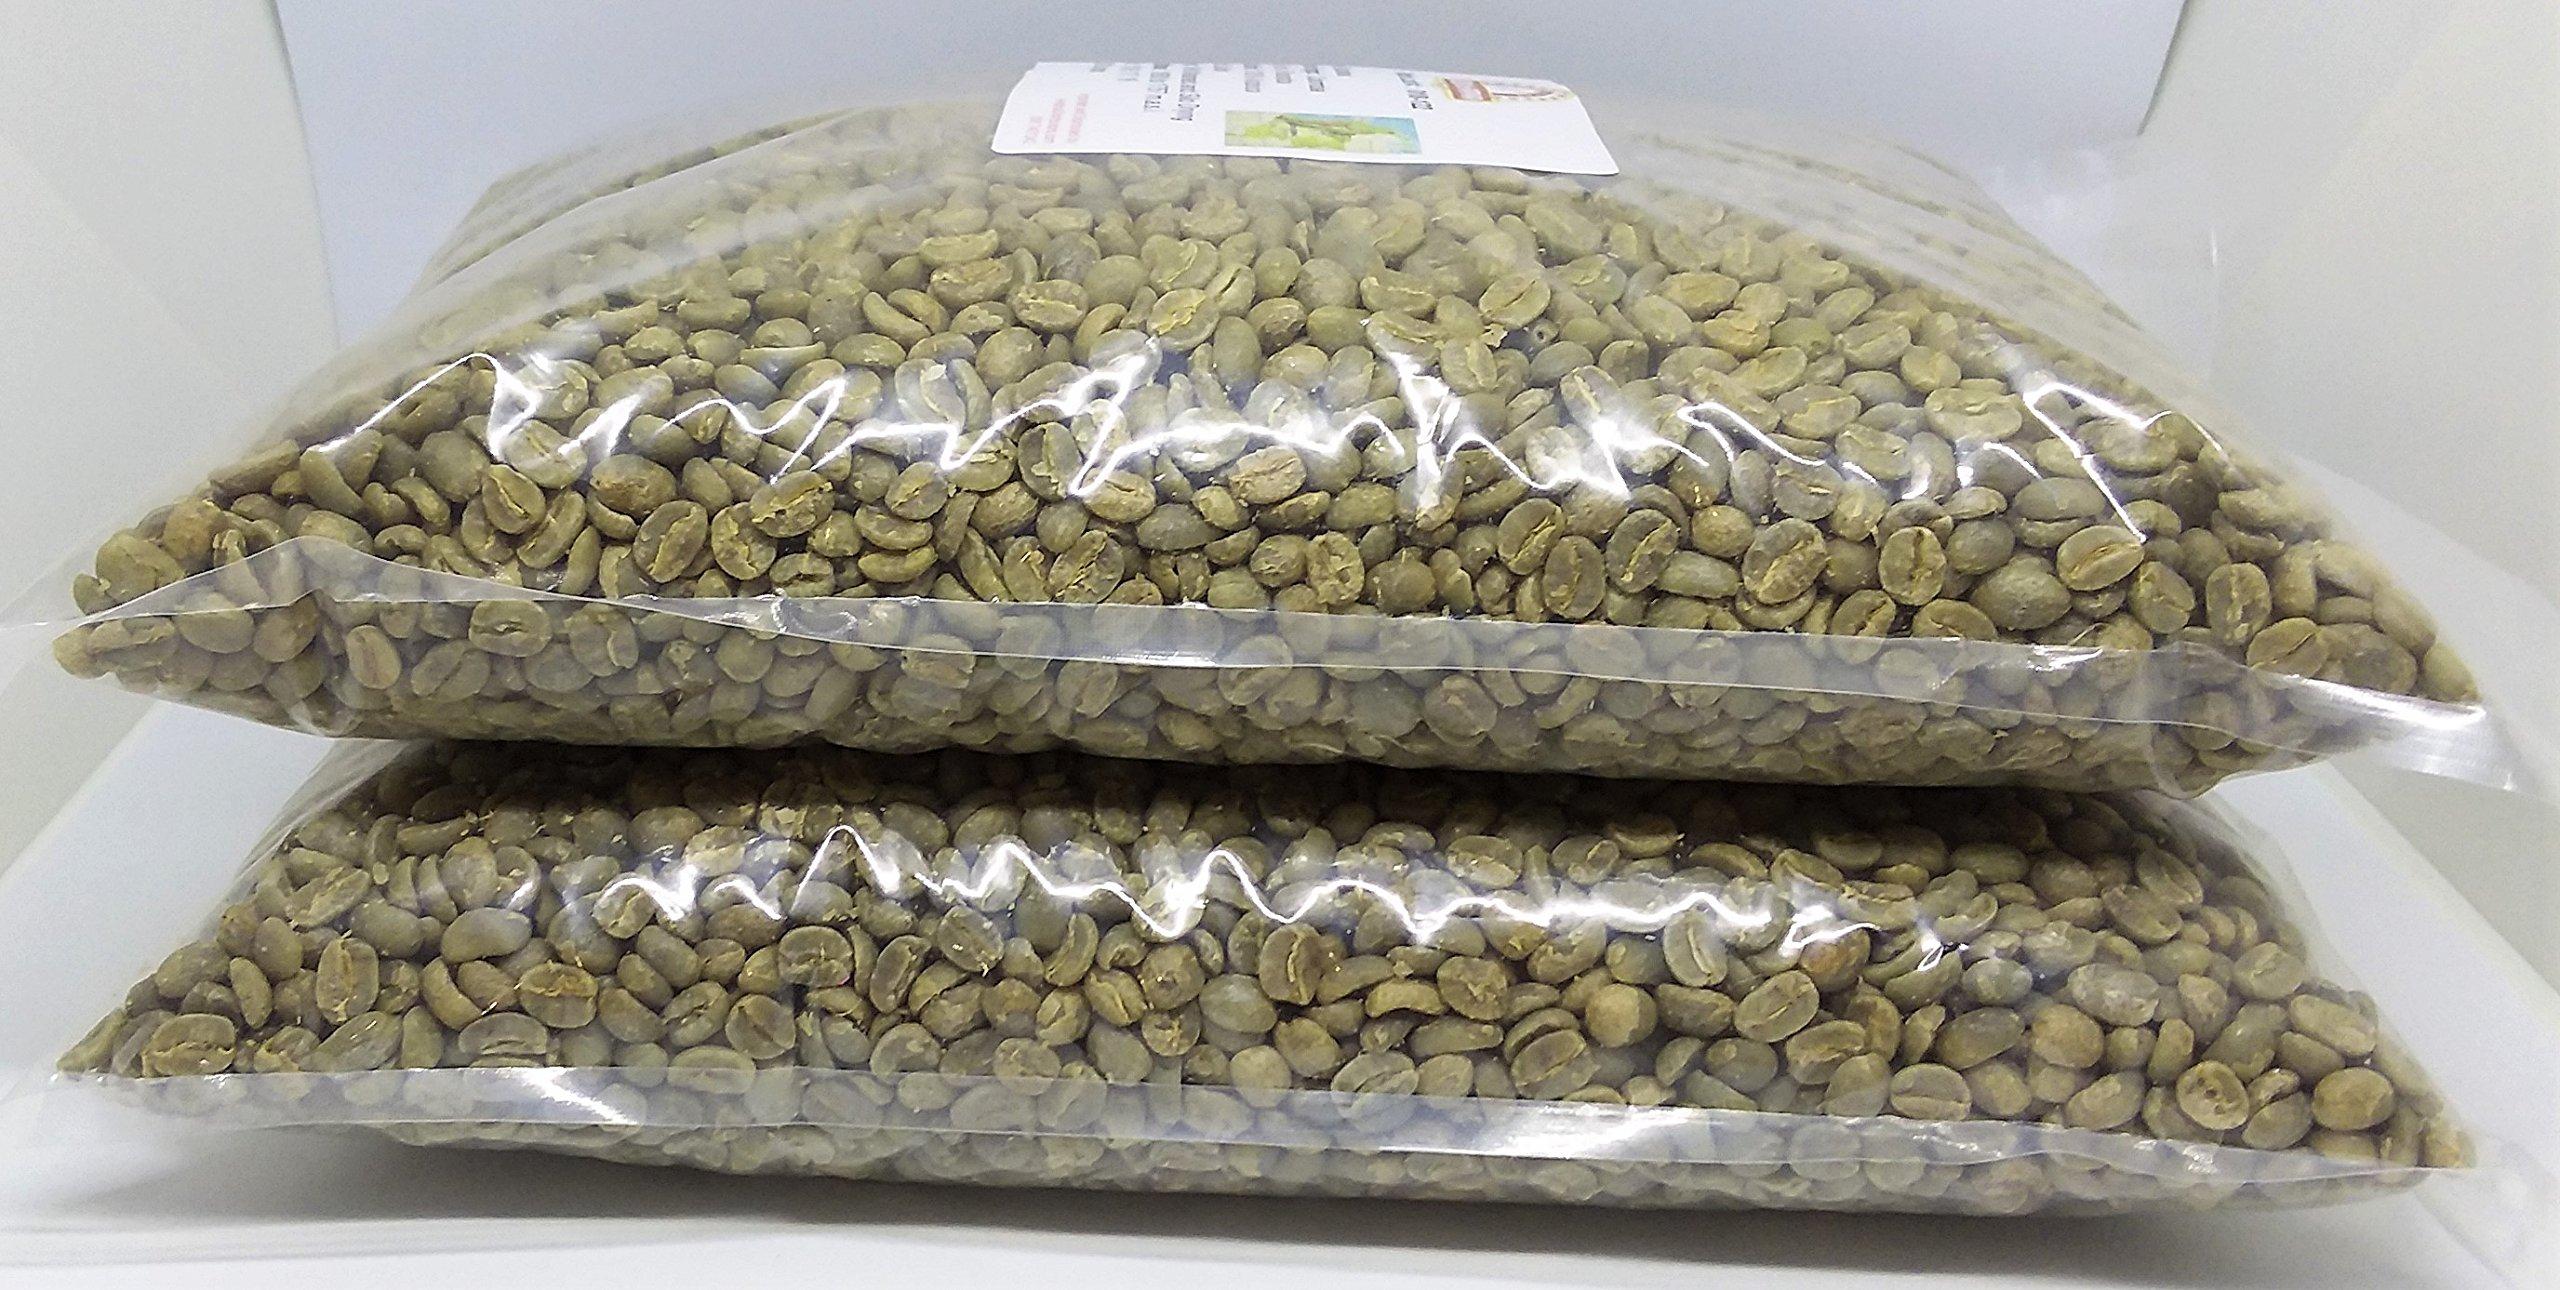 Green Coffee Beans Single Origin Colombian Unroasted Coffee Beans Farm Los Pirineos (10 Lb) by Micro Lot # 020-074